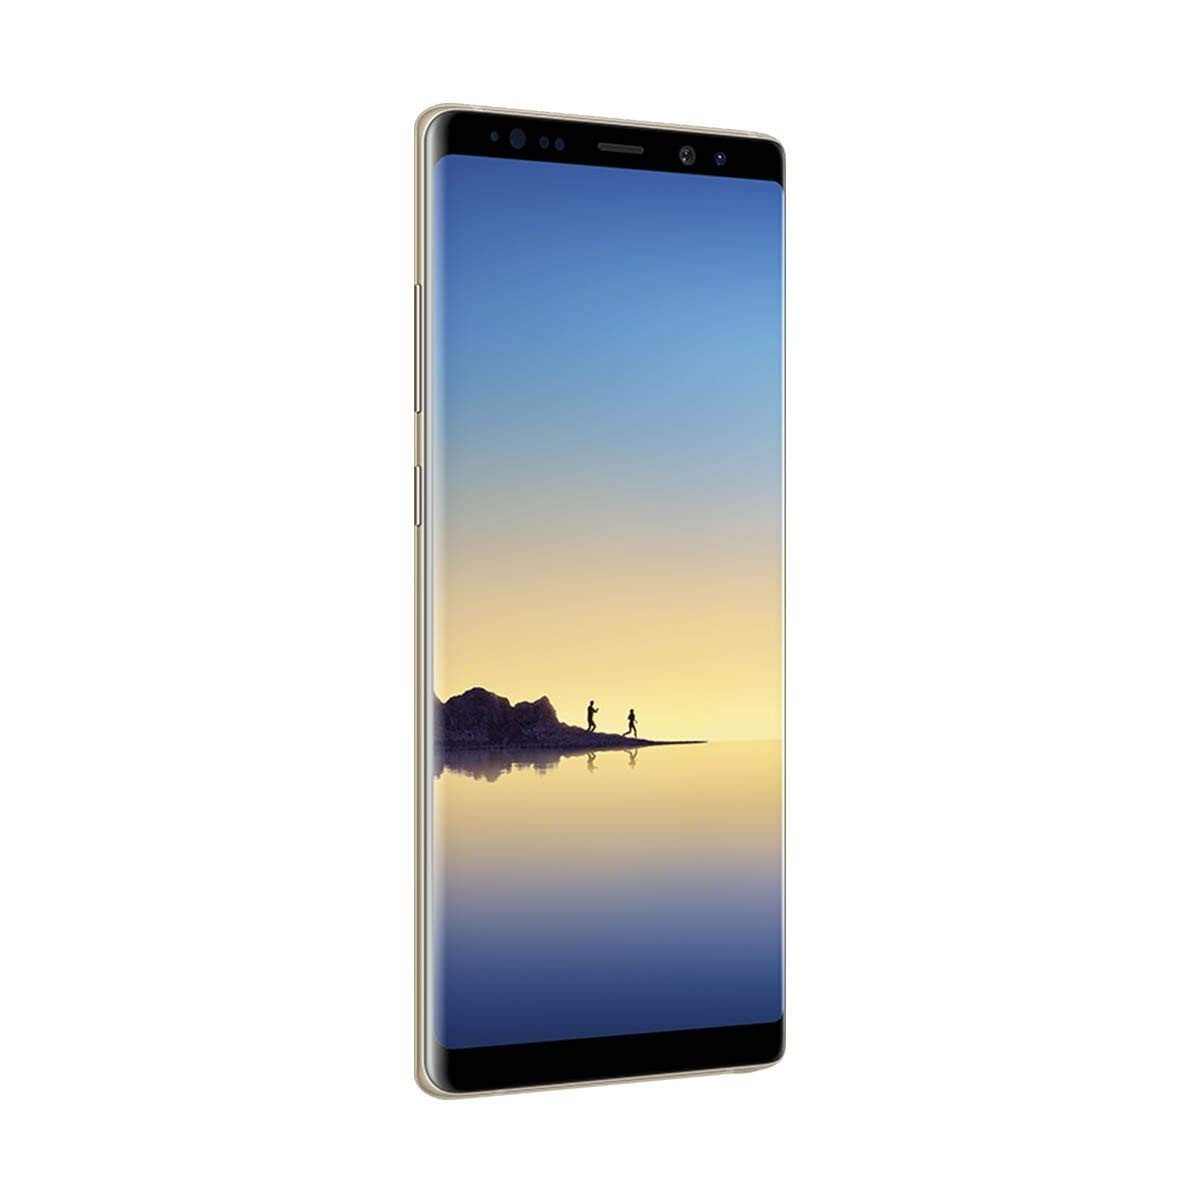 Samsung Galaxy Note 8 photo